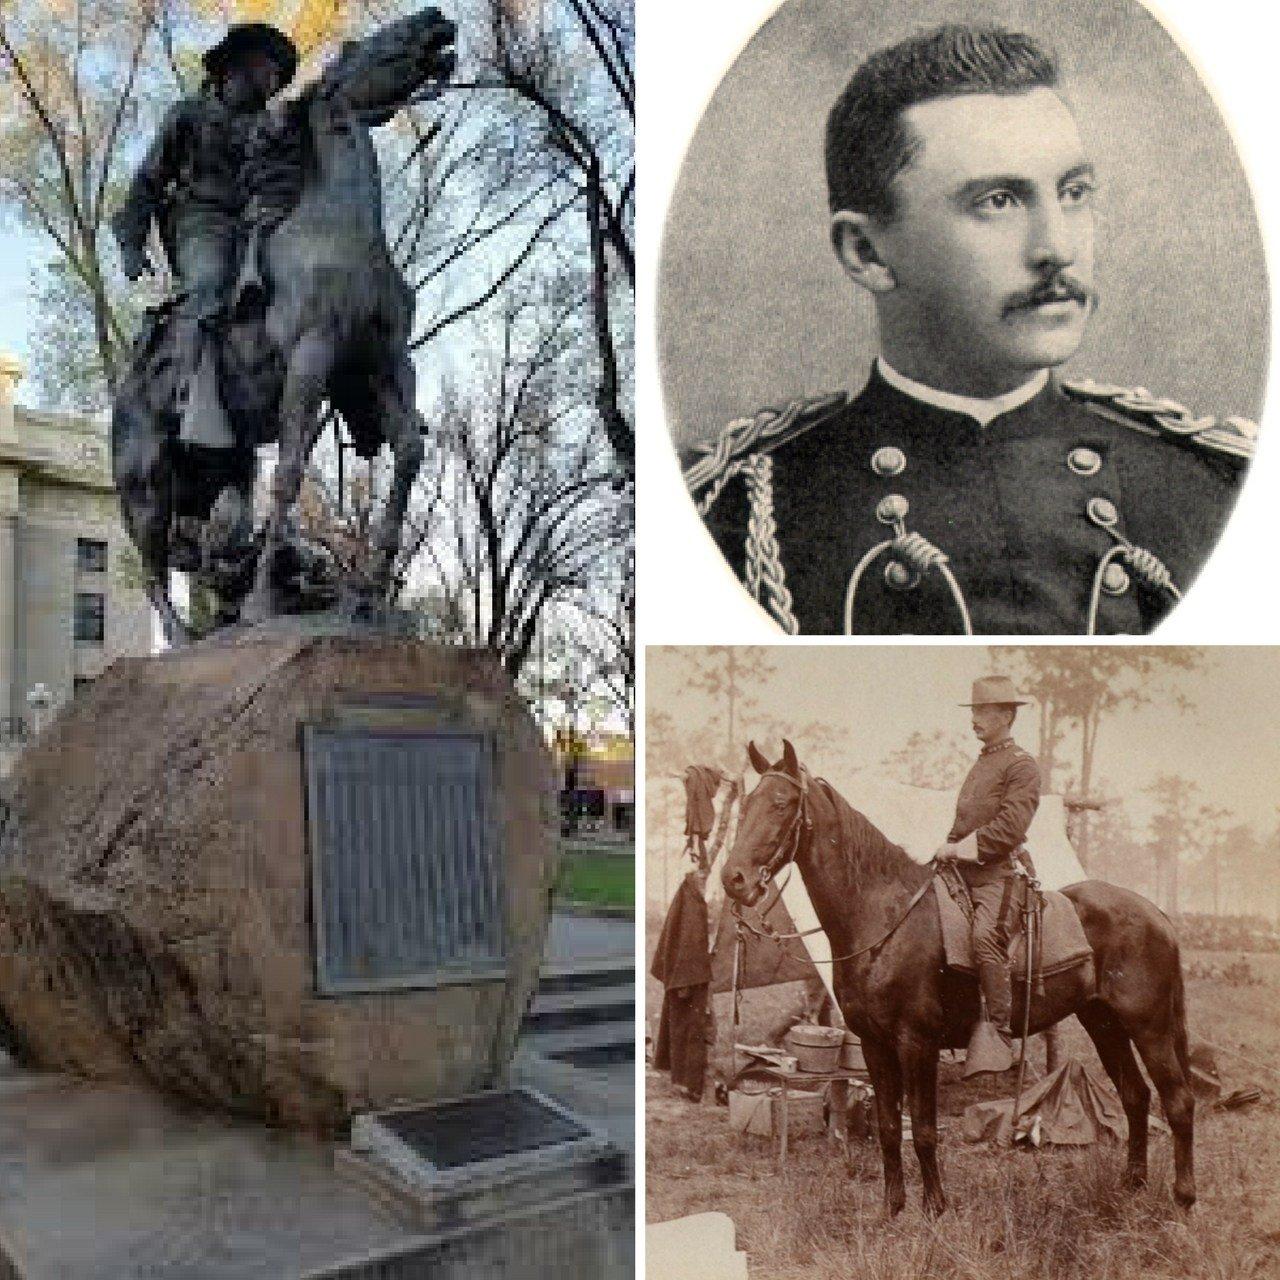 Capt. Buckey O'Neill of the famed Rough Riders. (Source: Arizona Historical Society)